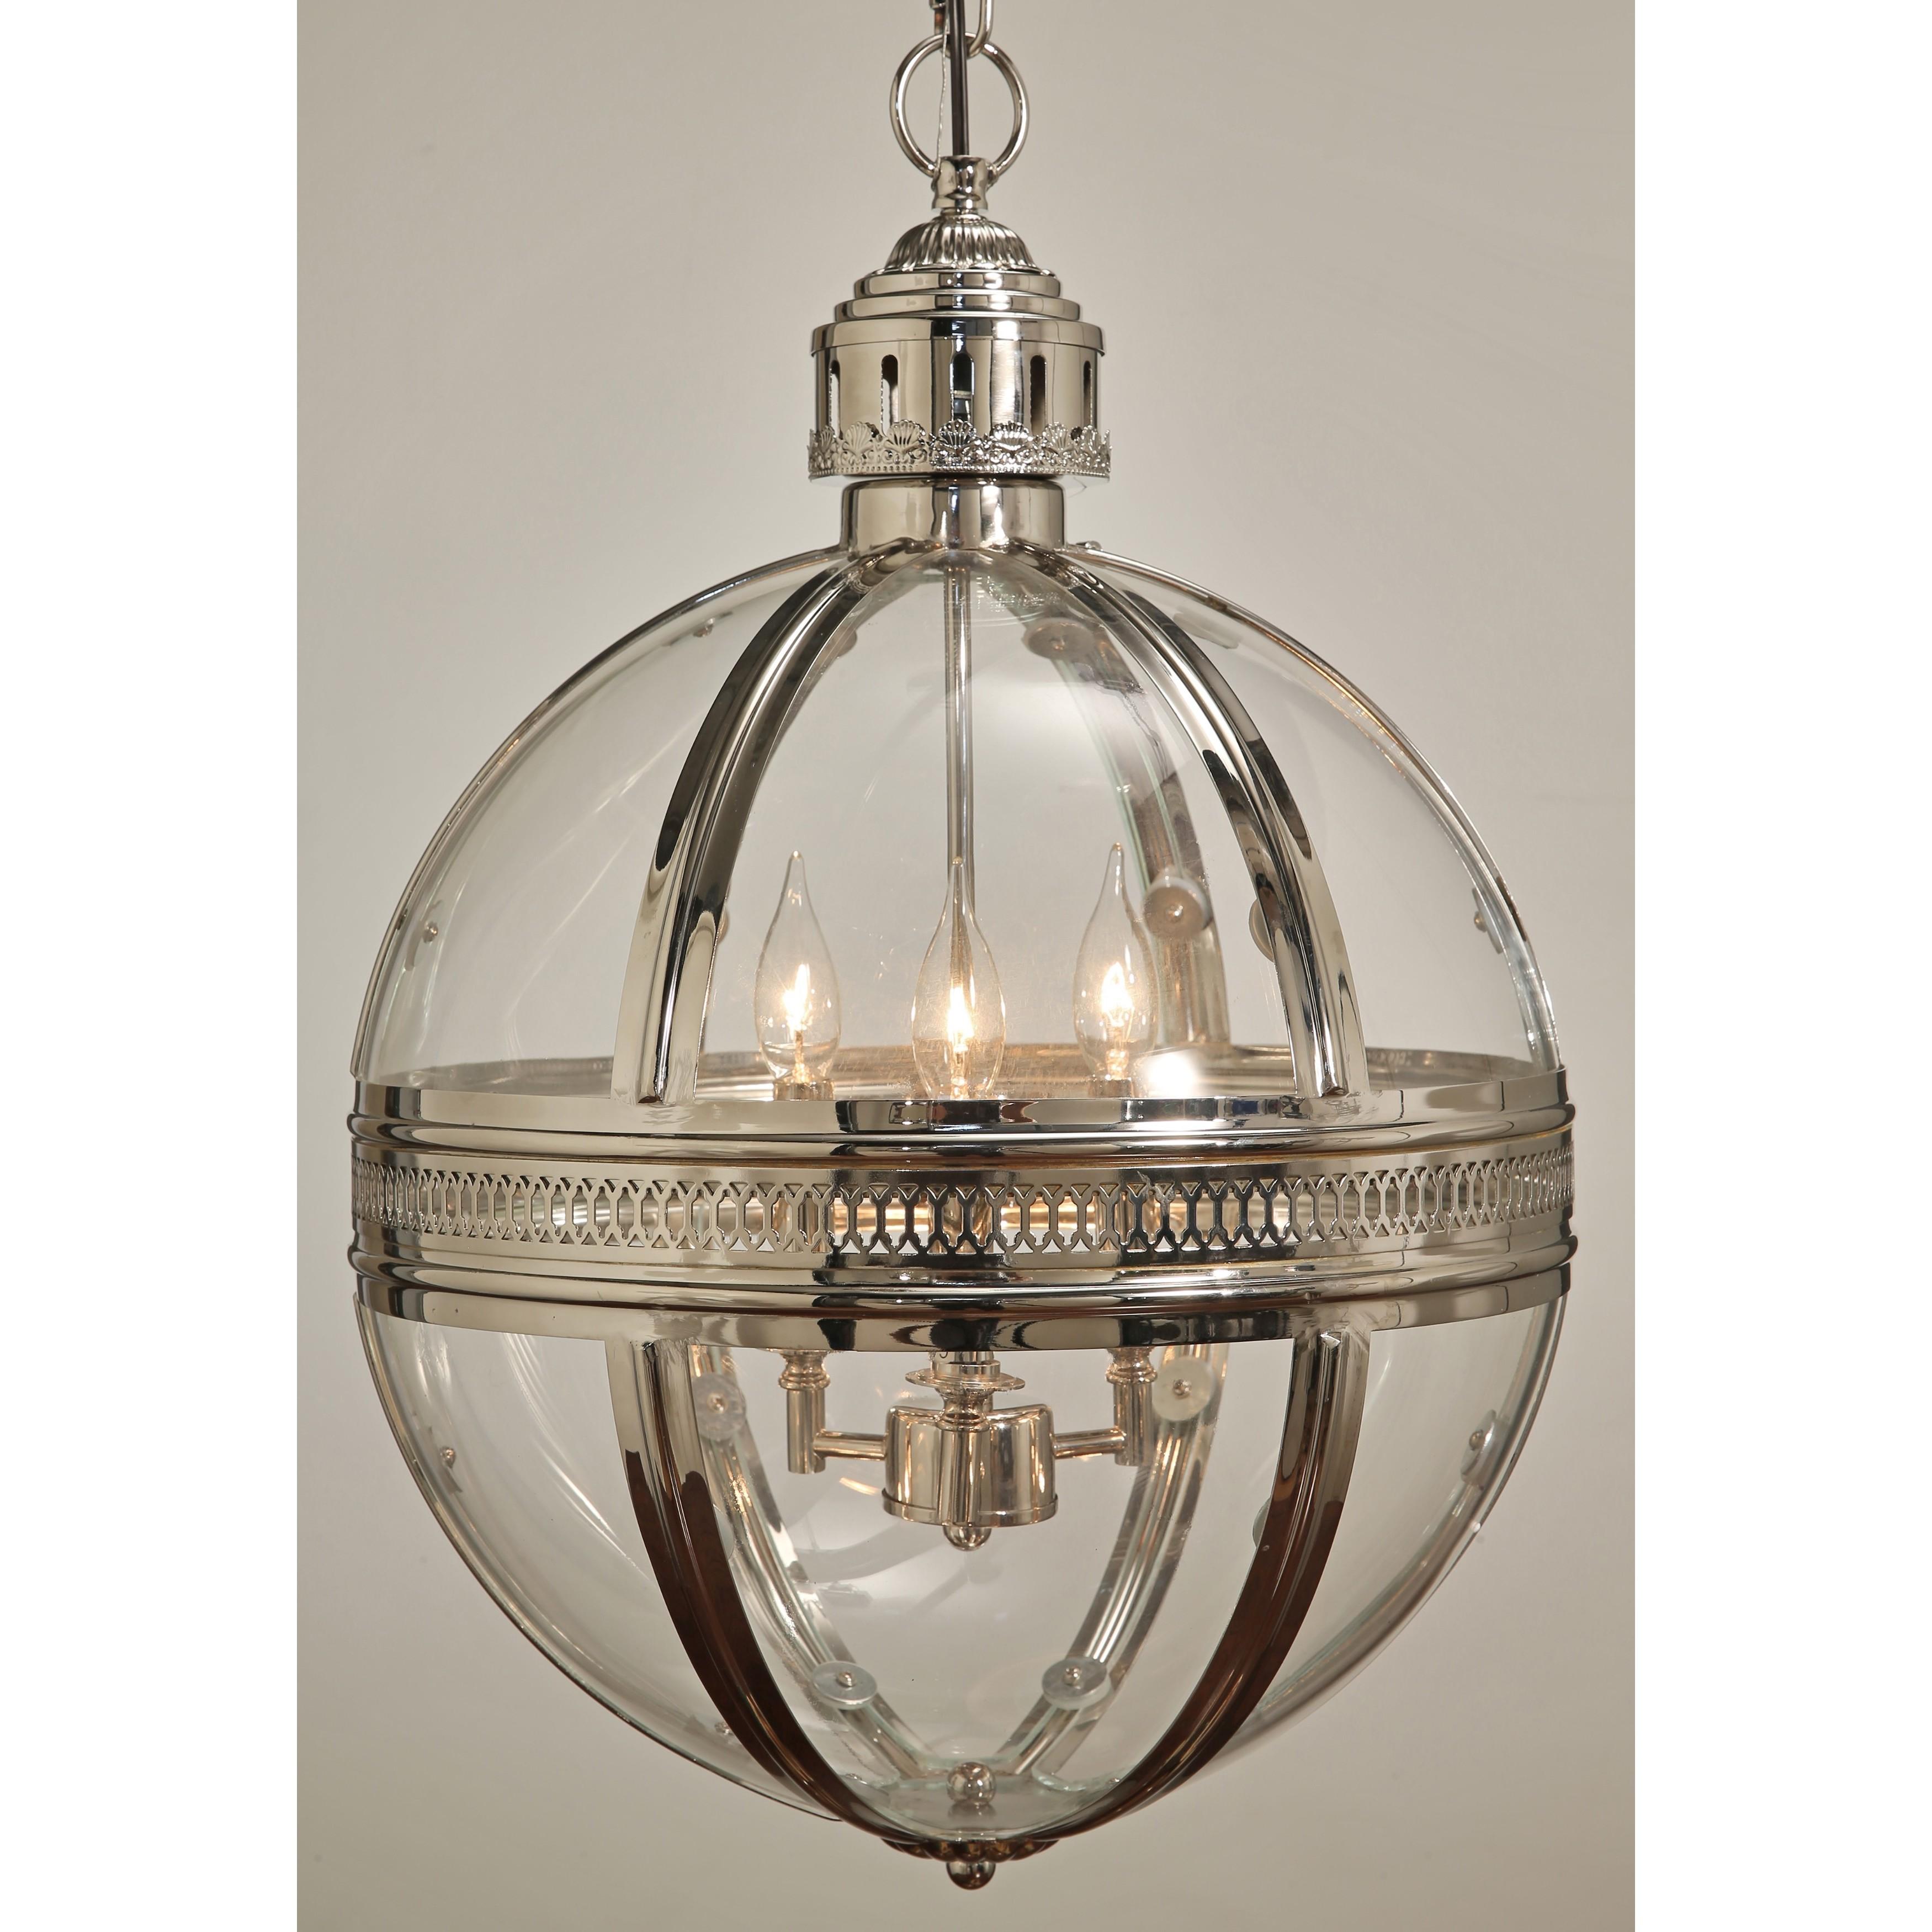 Abbyson bentley glass globe chandelier free shipping today abbyson bentley glass globe chandelier free shipping today overstock 20250562 aloadofball Gallery